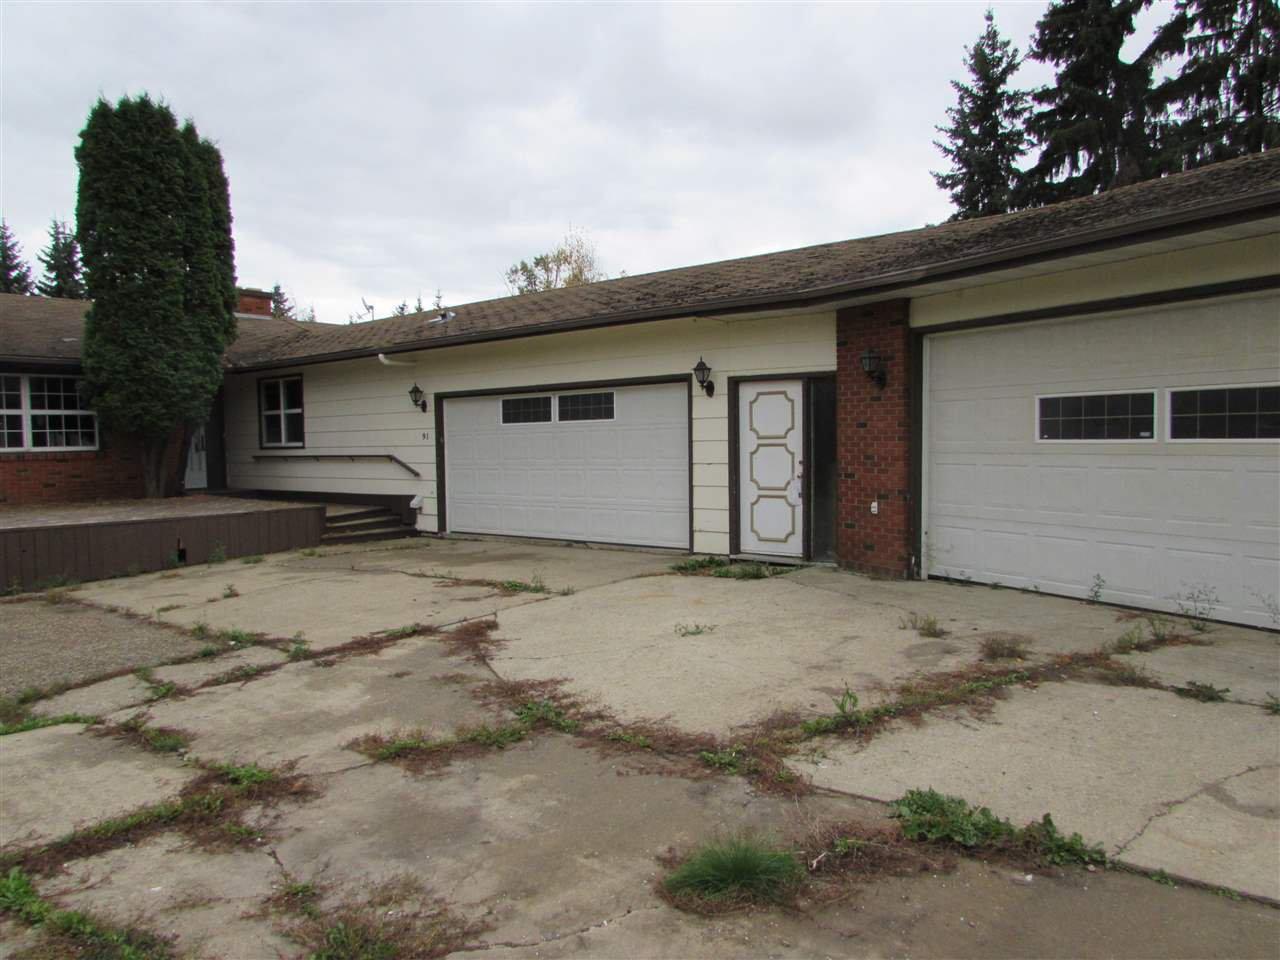 Main Photo: 91 SHULTZ Crescent: Rural Sturgeon County House for sale : MLS®# E4175419